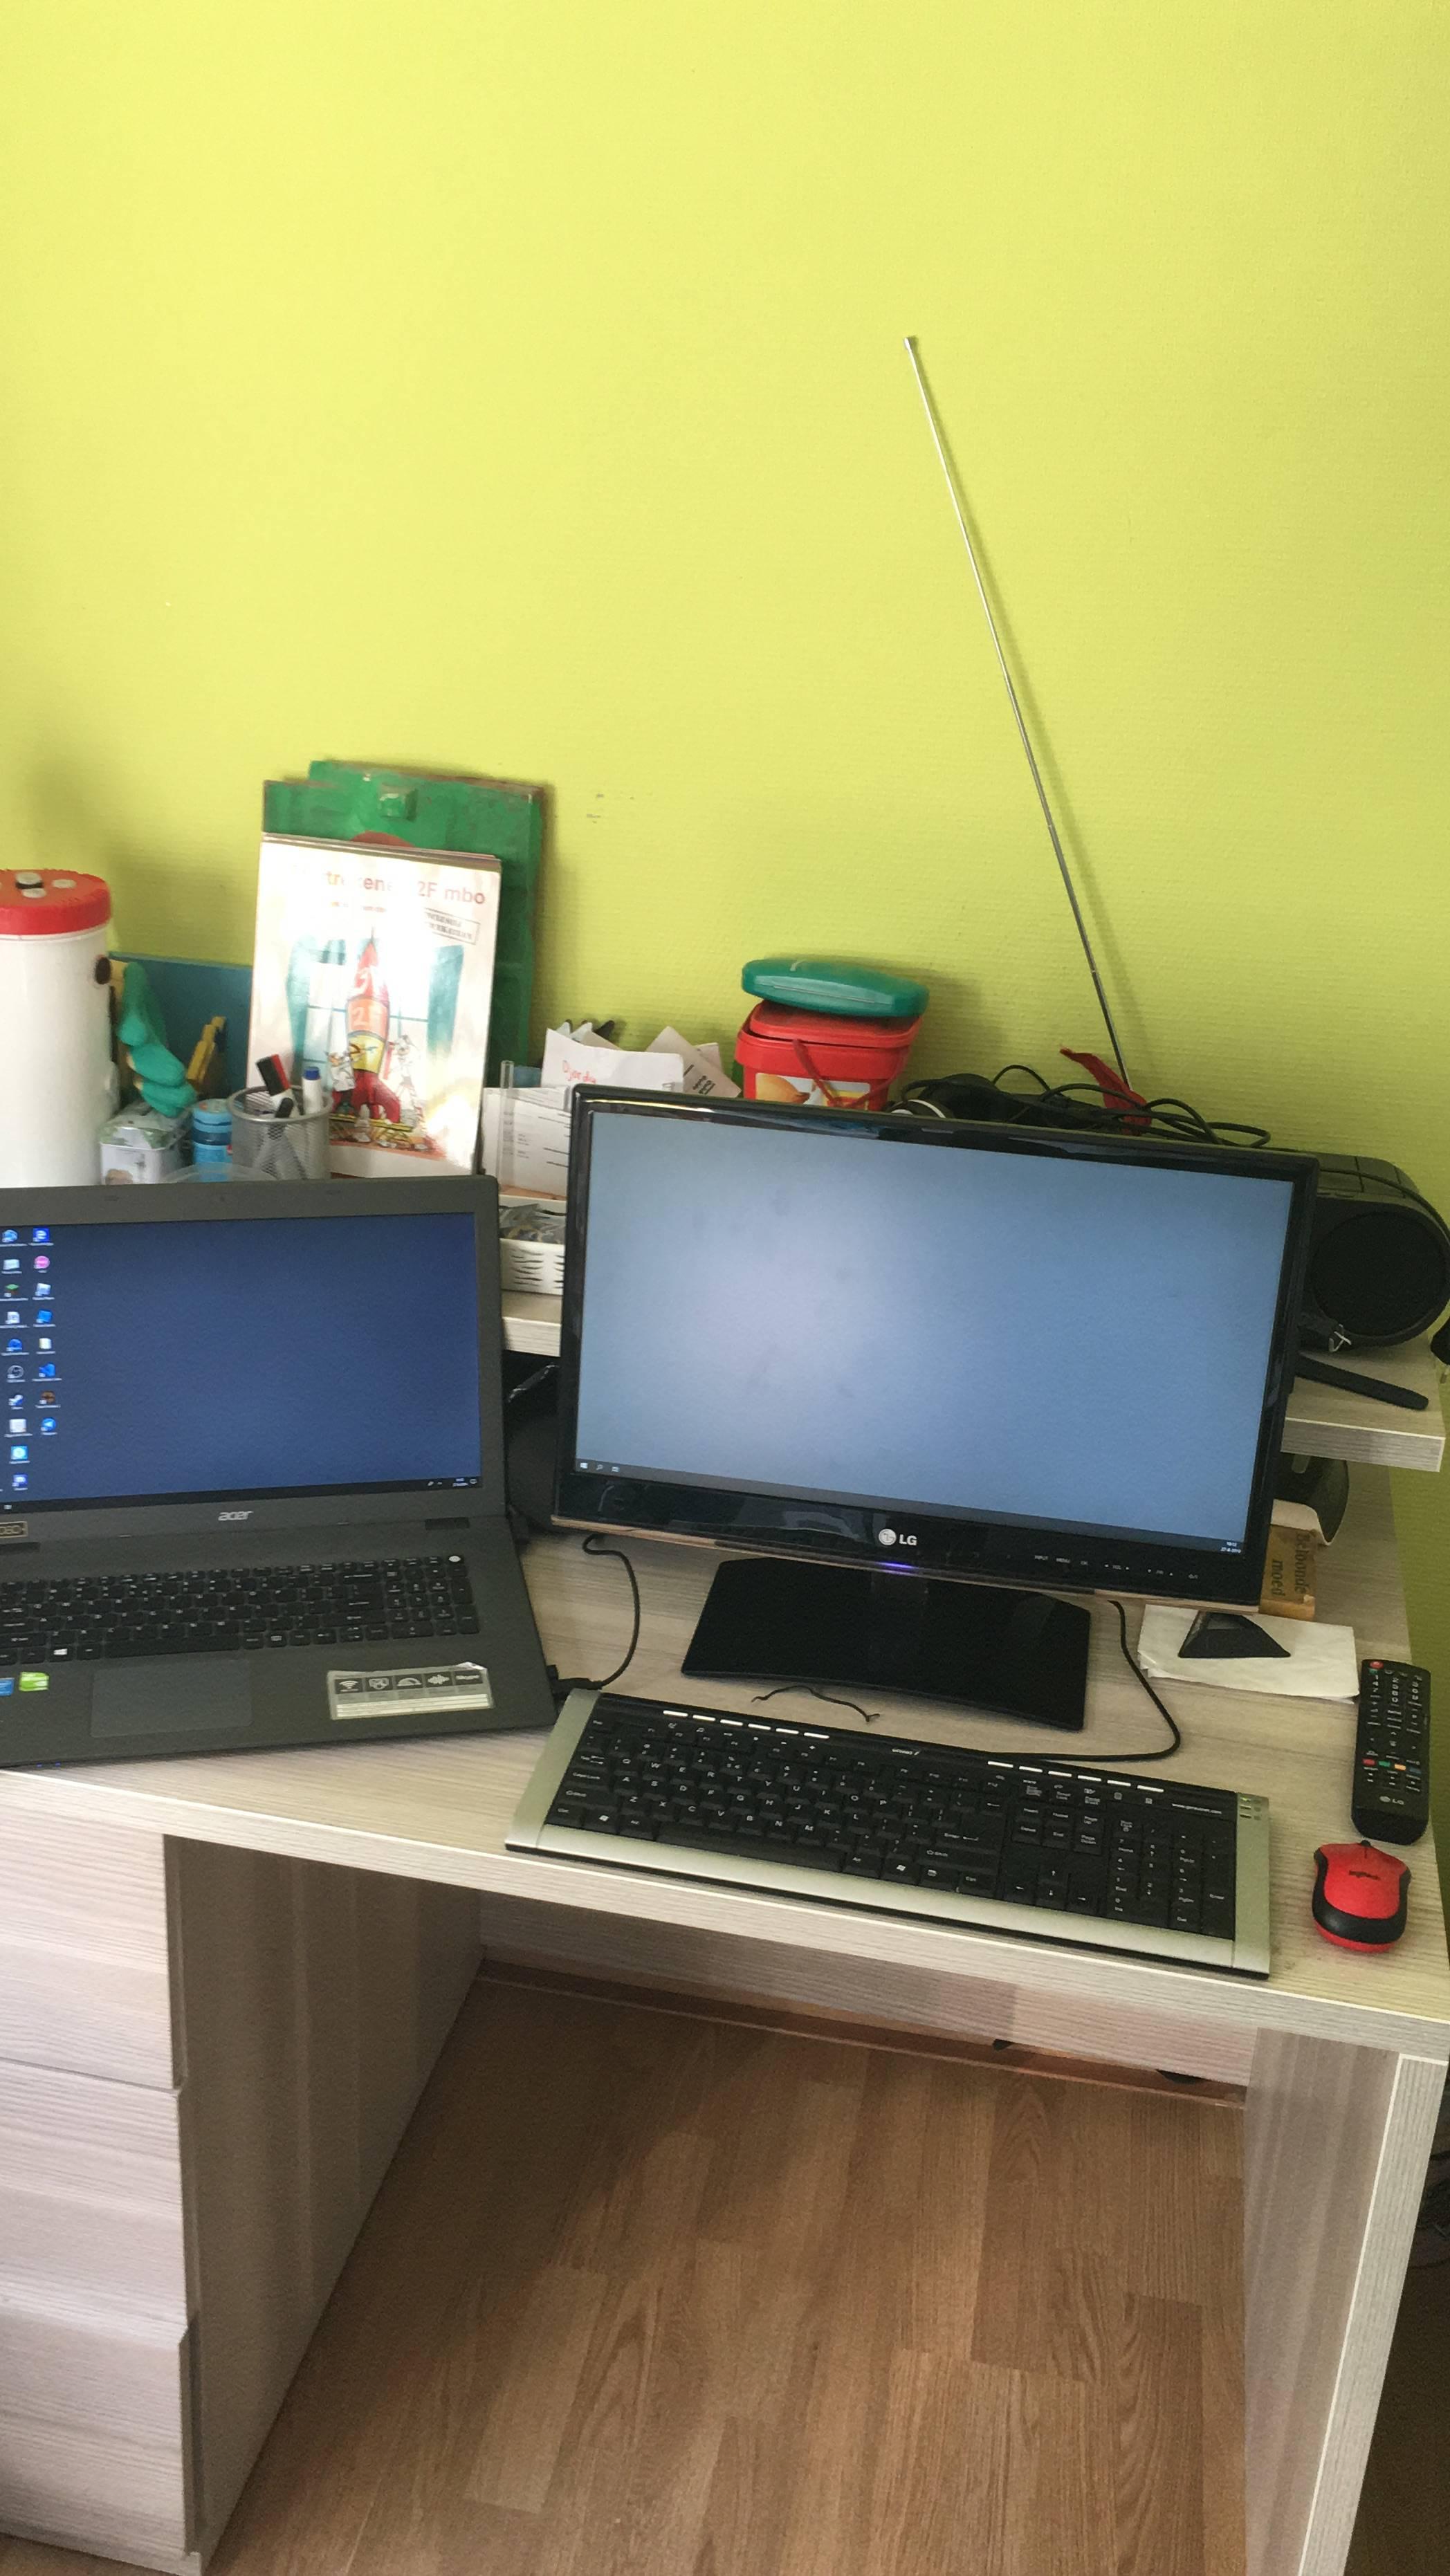 jfcjohnfolf's Setup - This litle setup I own | Scooget